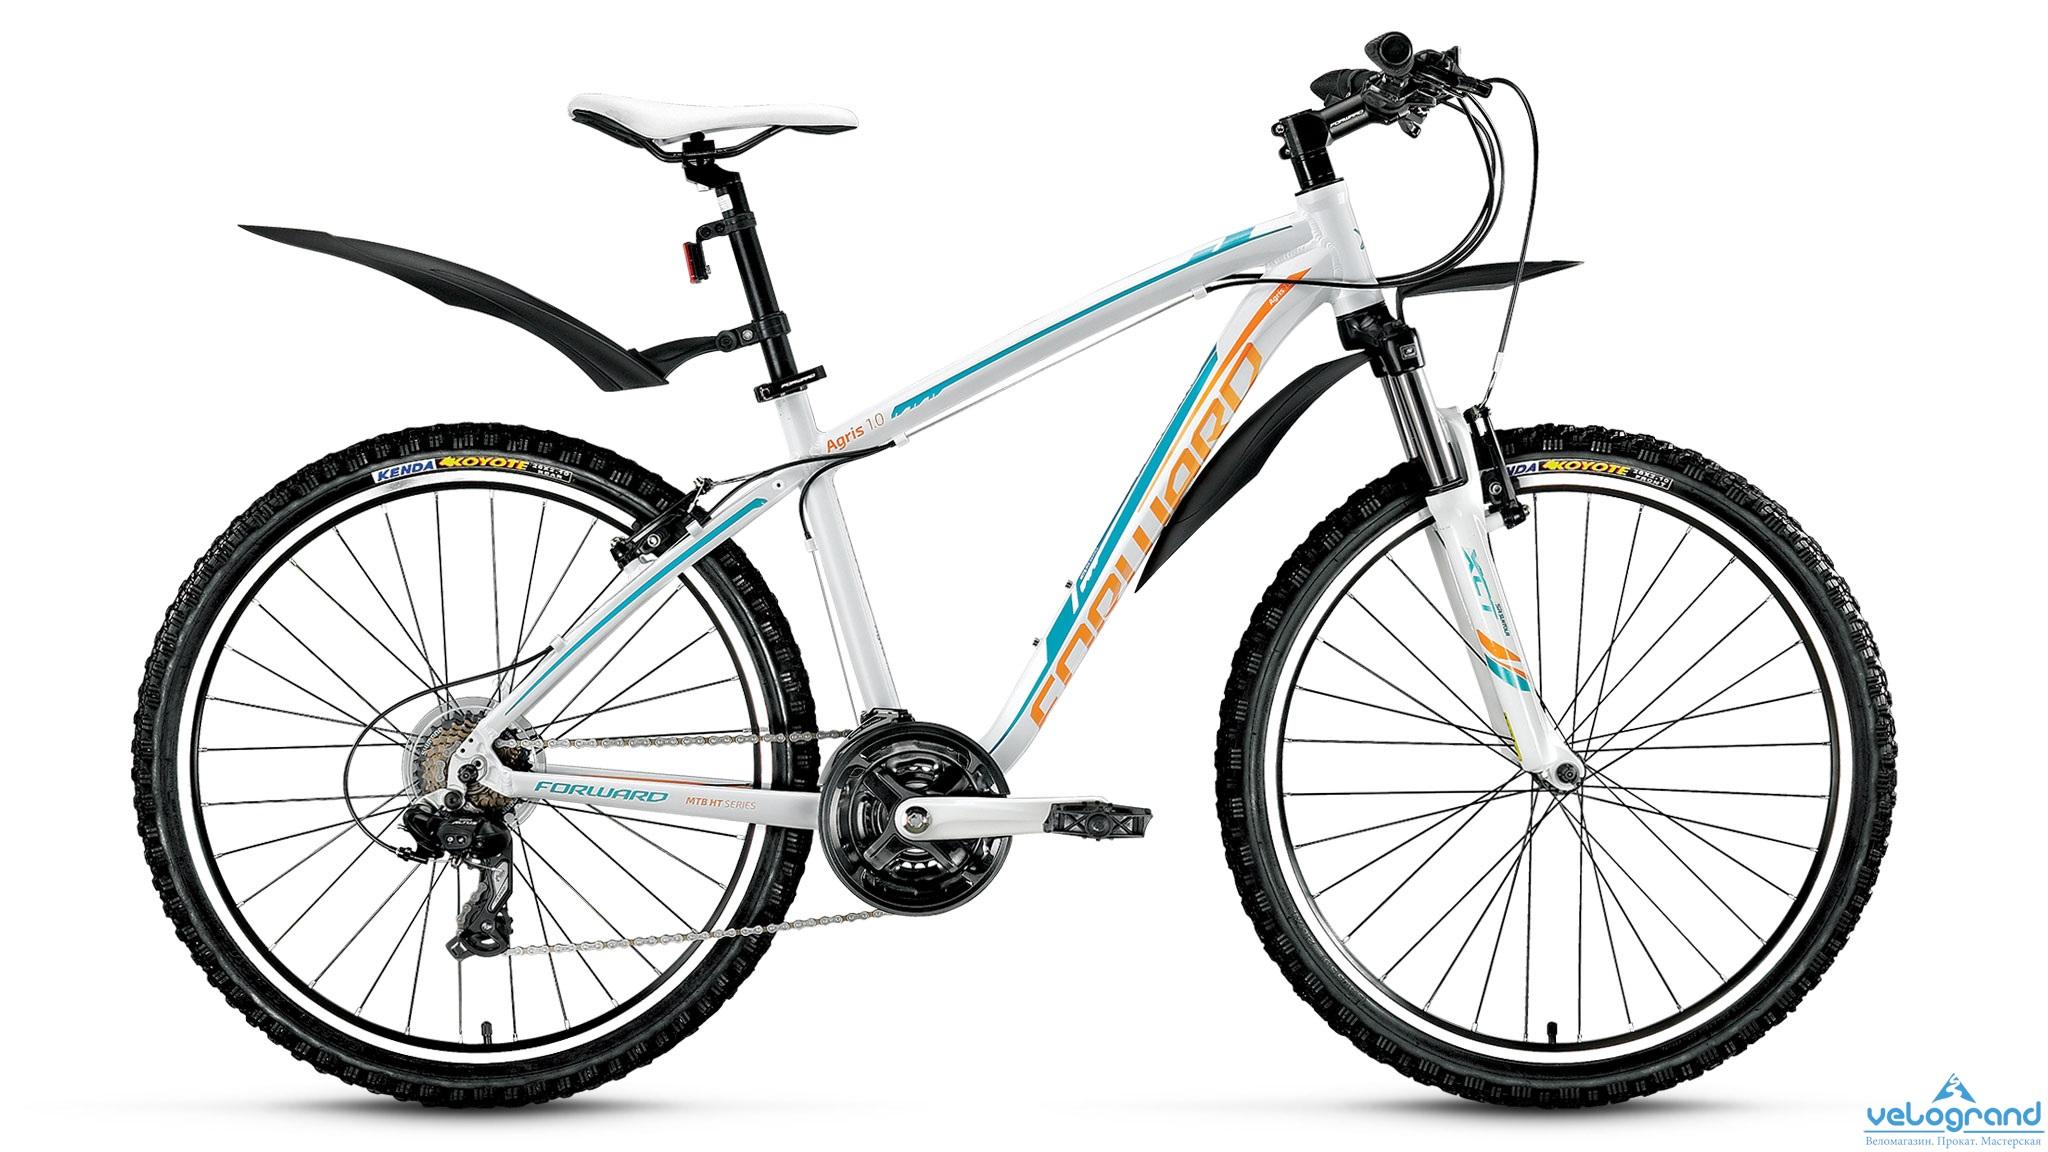 Женский велосипед Forward Agris Lady 1.0 (2016) от Velogrand